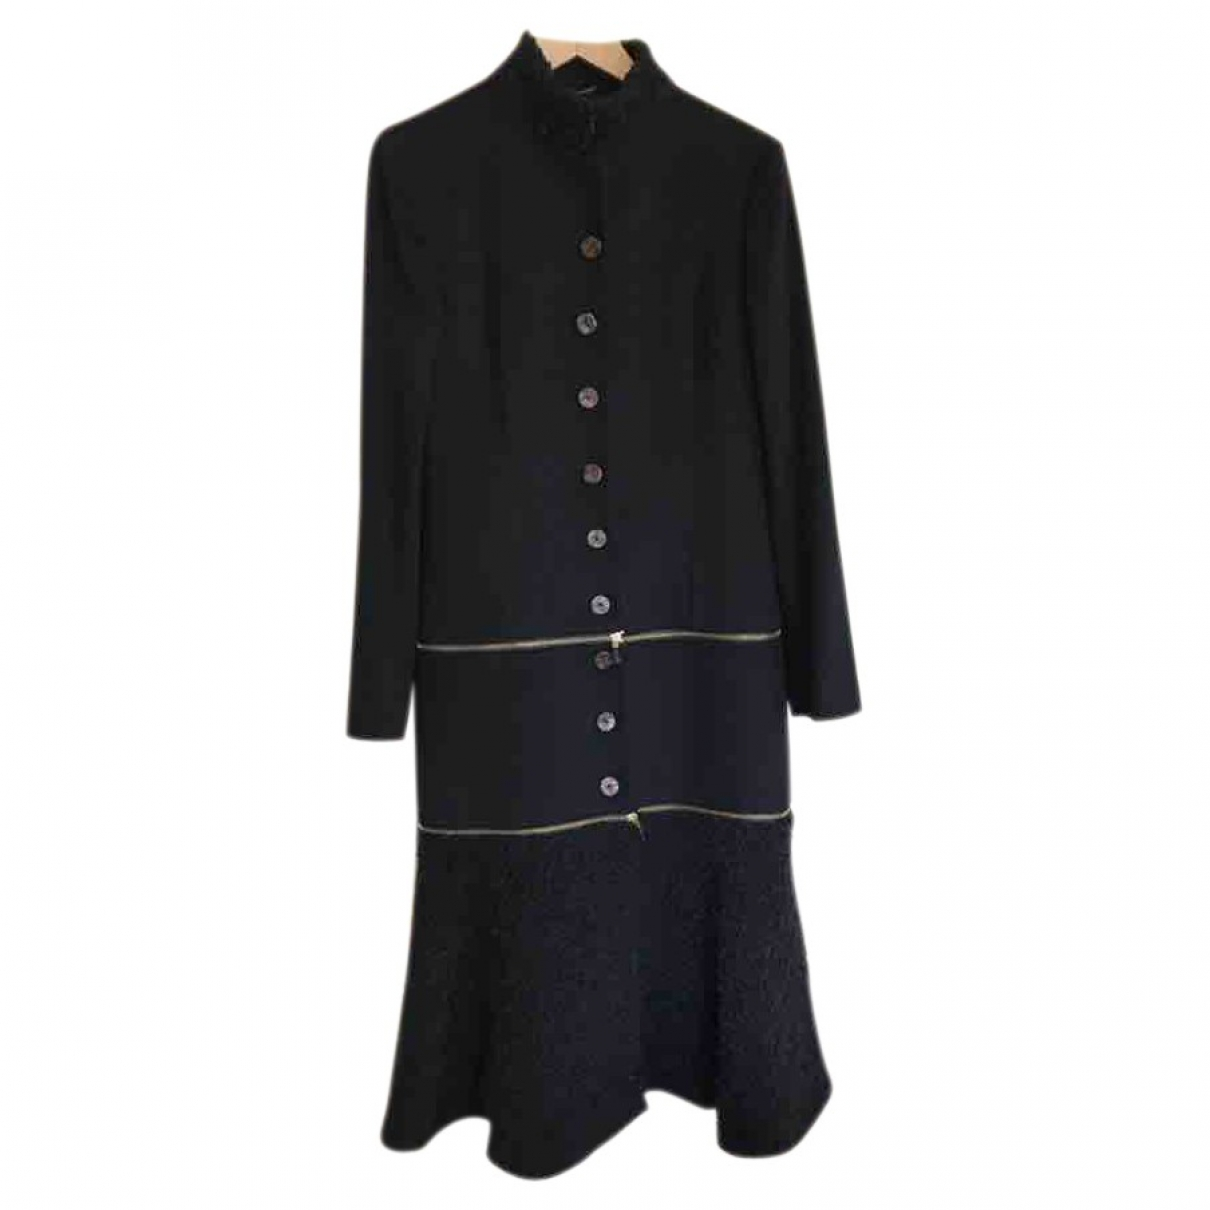 Alexander Mcqueen \N Black Cashmere coat for Women 42 FR